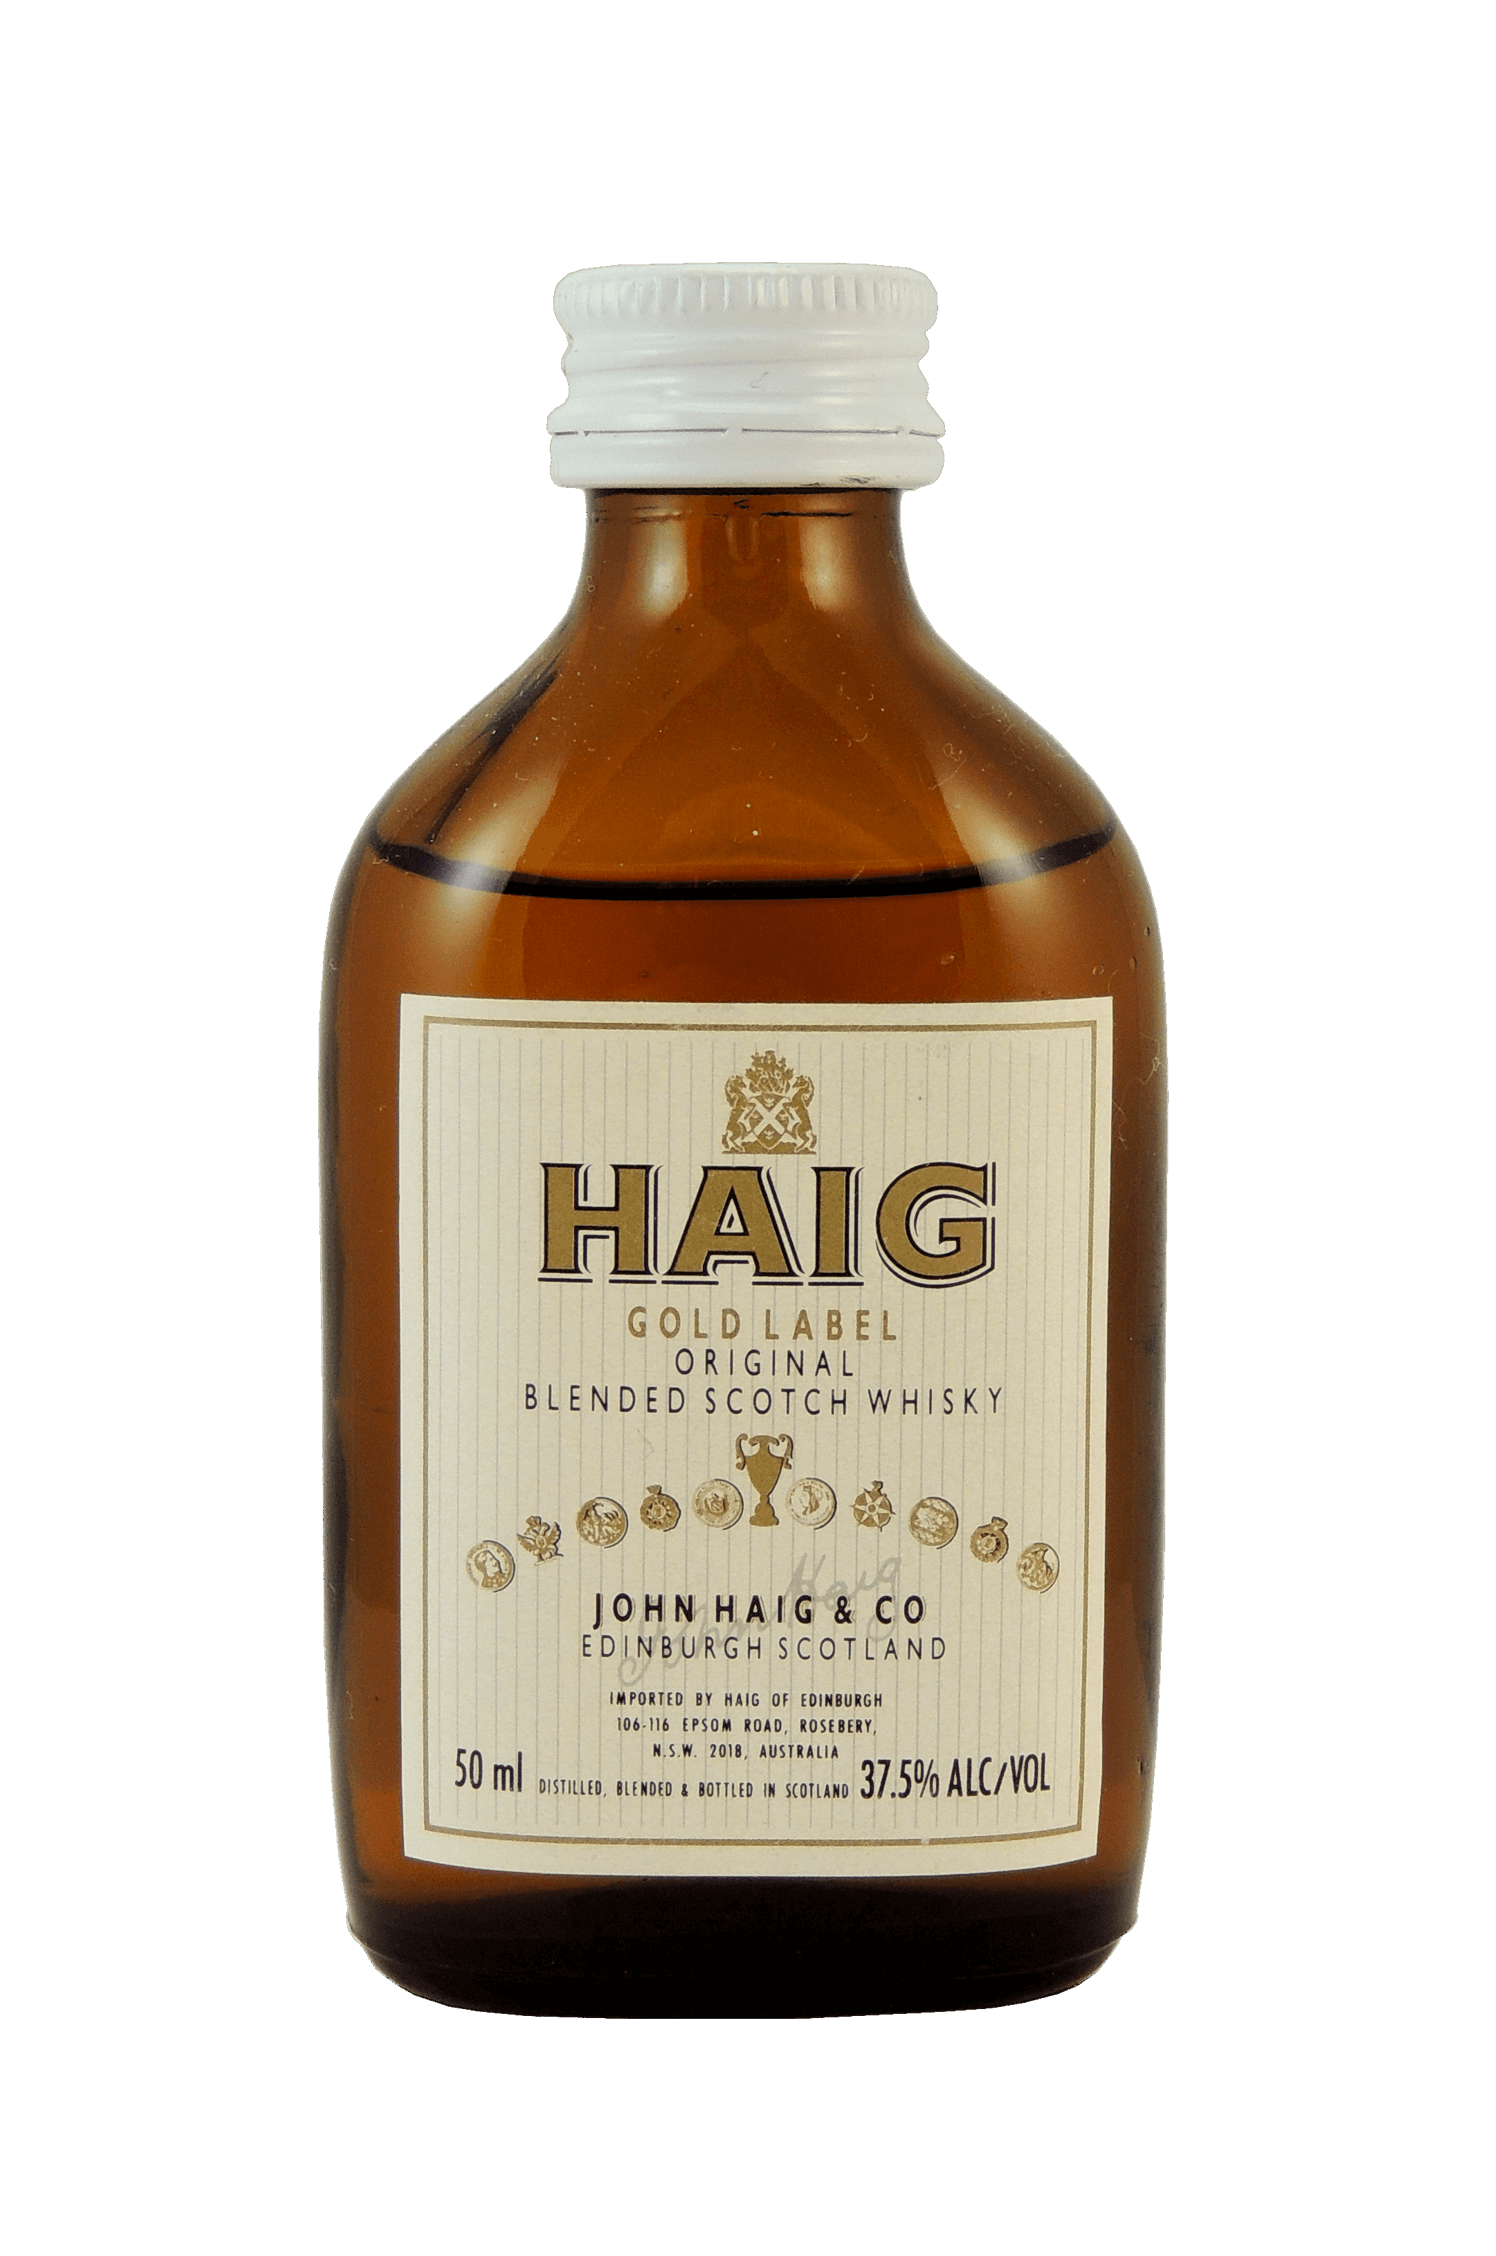 Haig Scotch Whisky